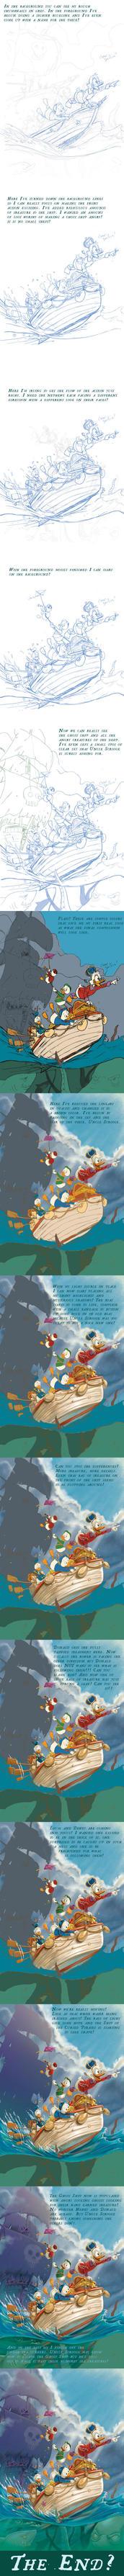 Ducktales Clear Sailin' Digital Painting Progress by PaulRomanMartinez